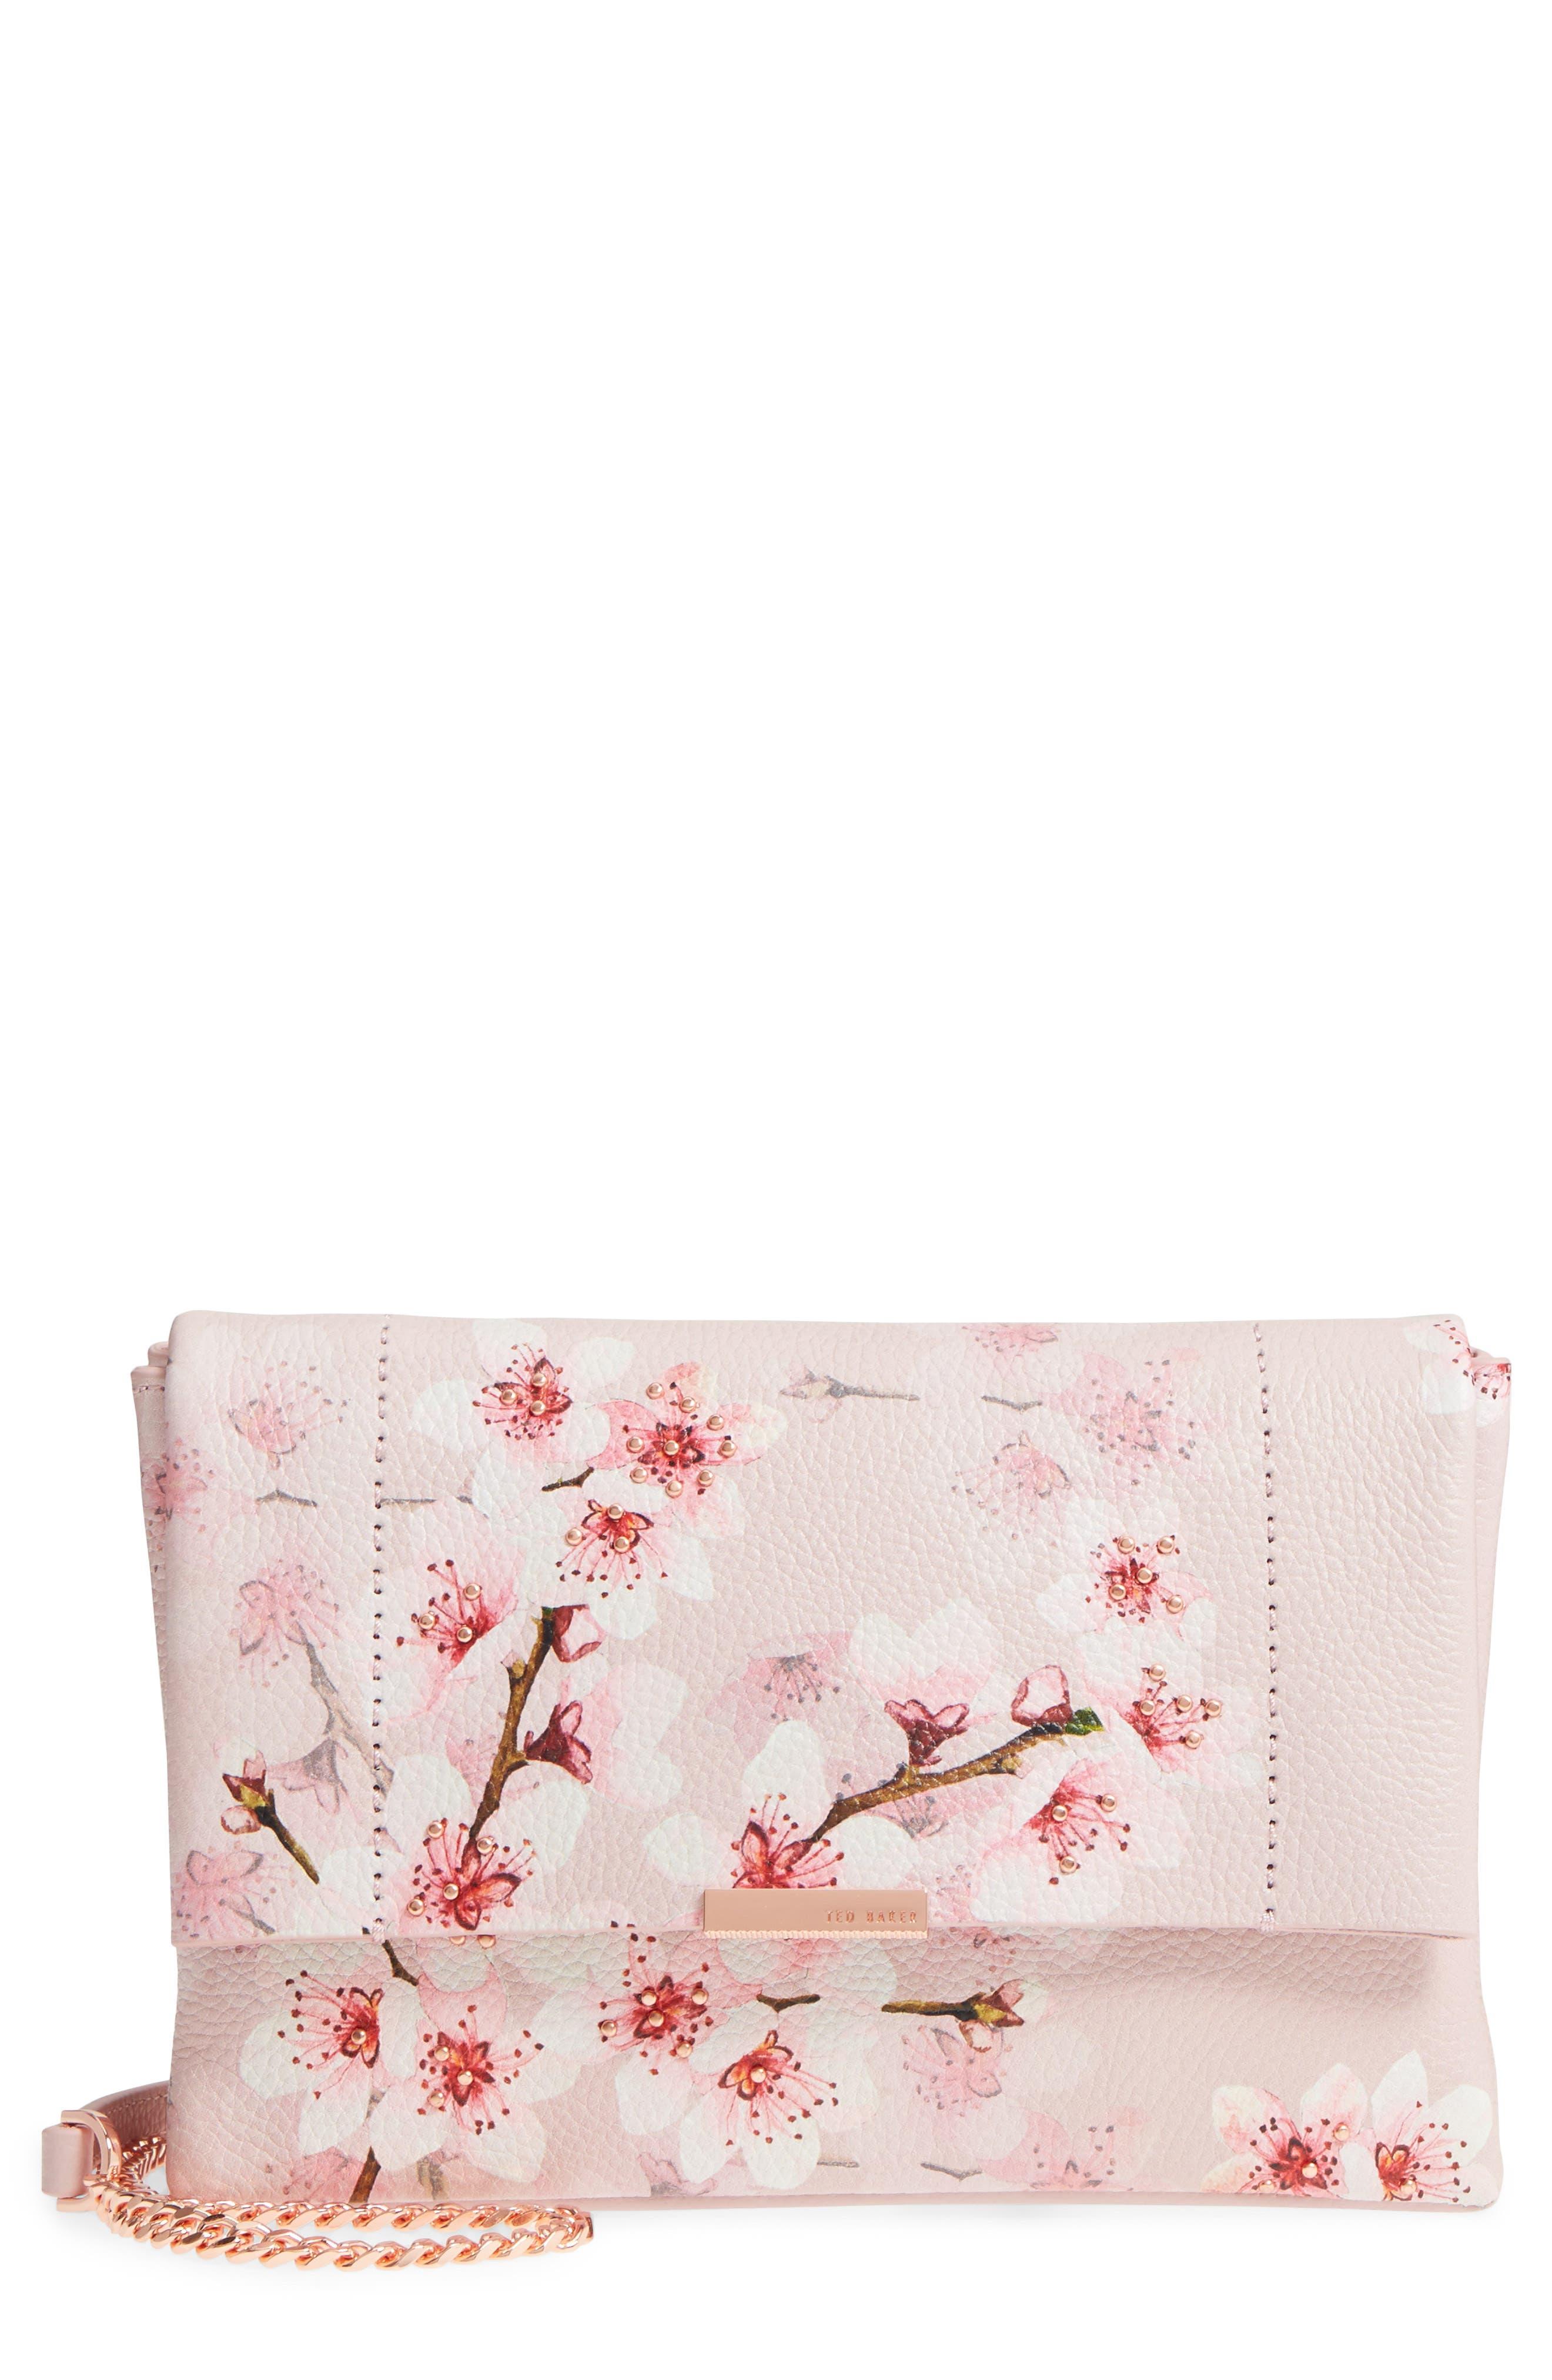 Ted Baker London Jayy Soft Blossom Leather Crossbody Bag